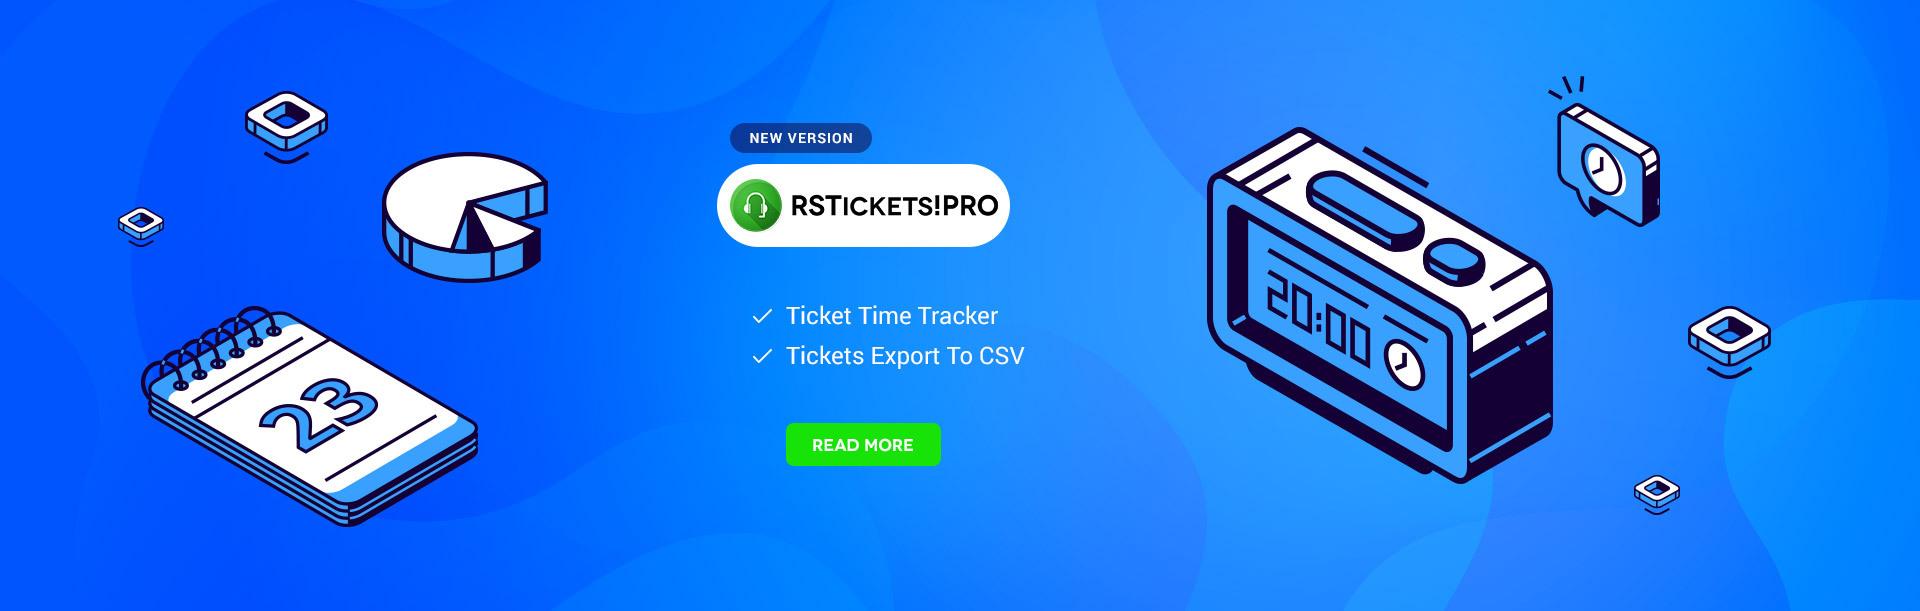 RSTickets!Pro 2.4.0